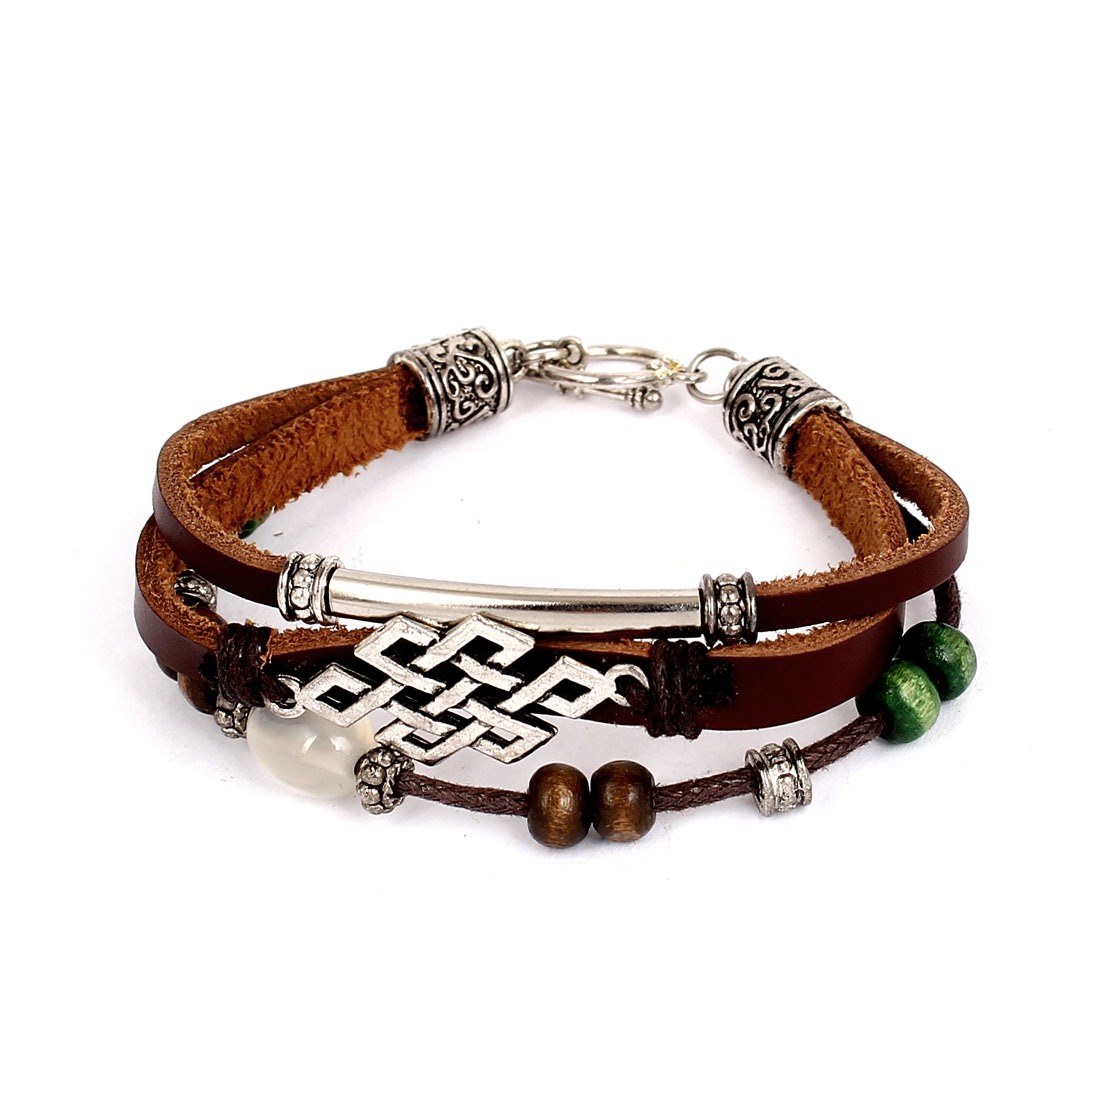 Women Retro Style Plastic Pearl Decor Interlocking Faux Leather Wrist Bracelet